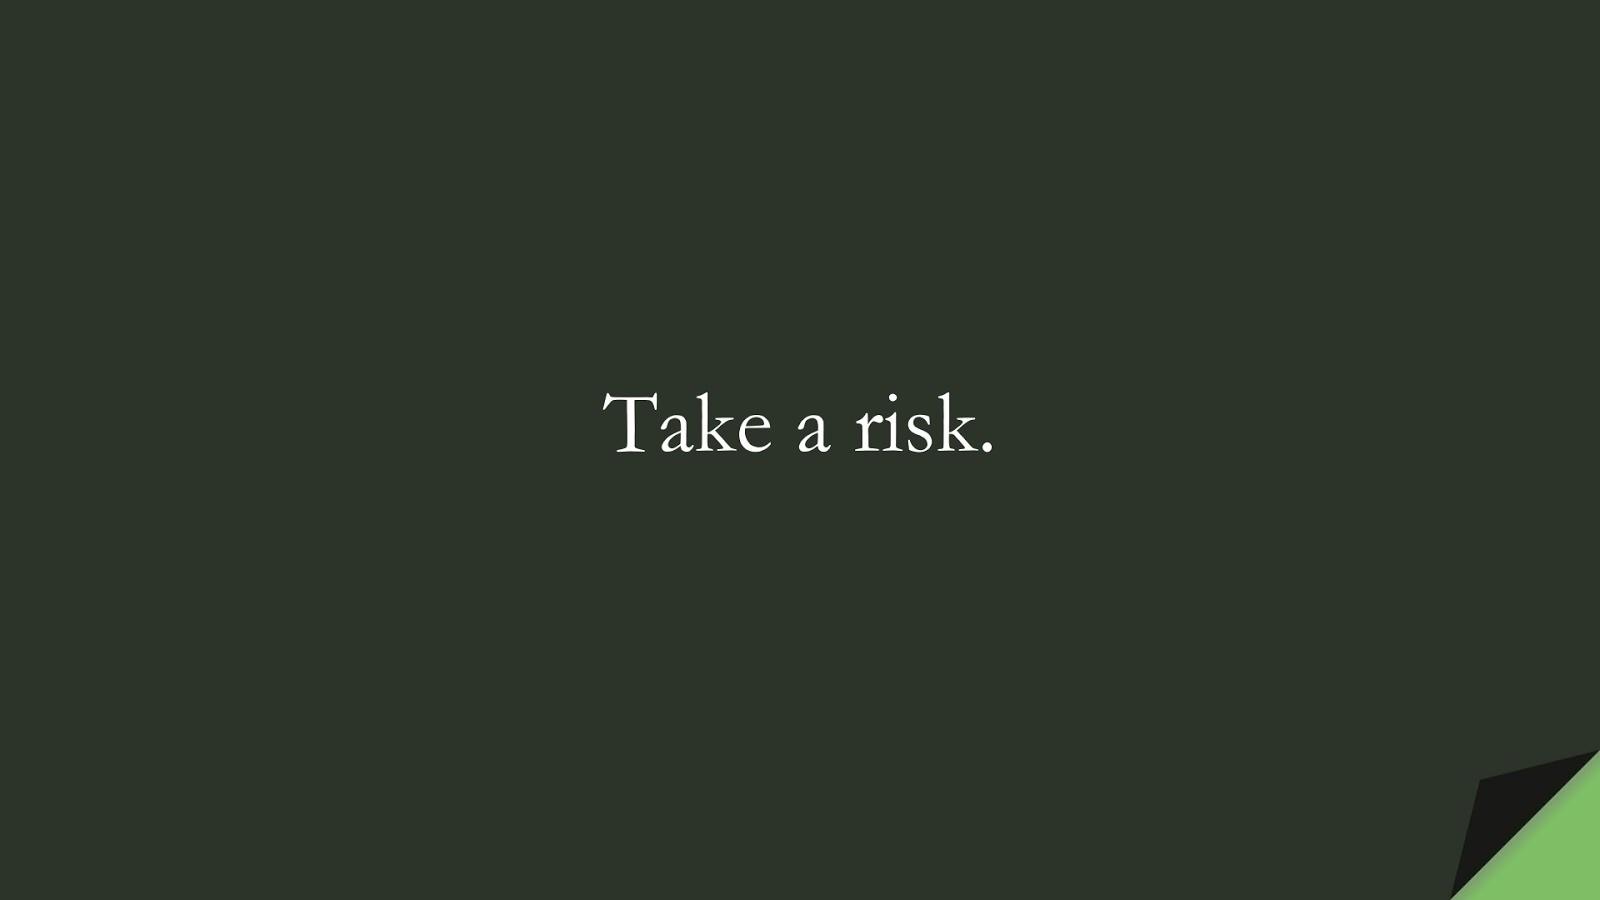 Take a risk.FALSE